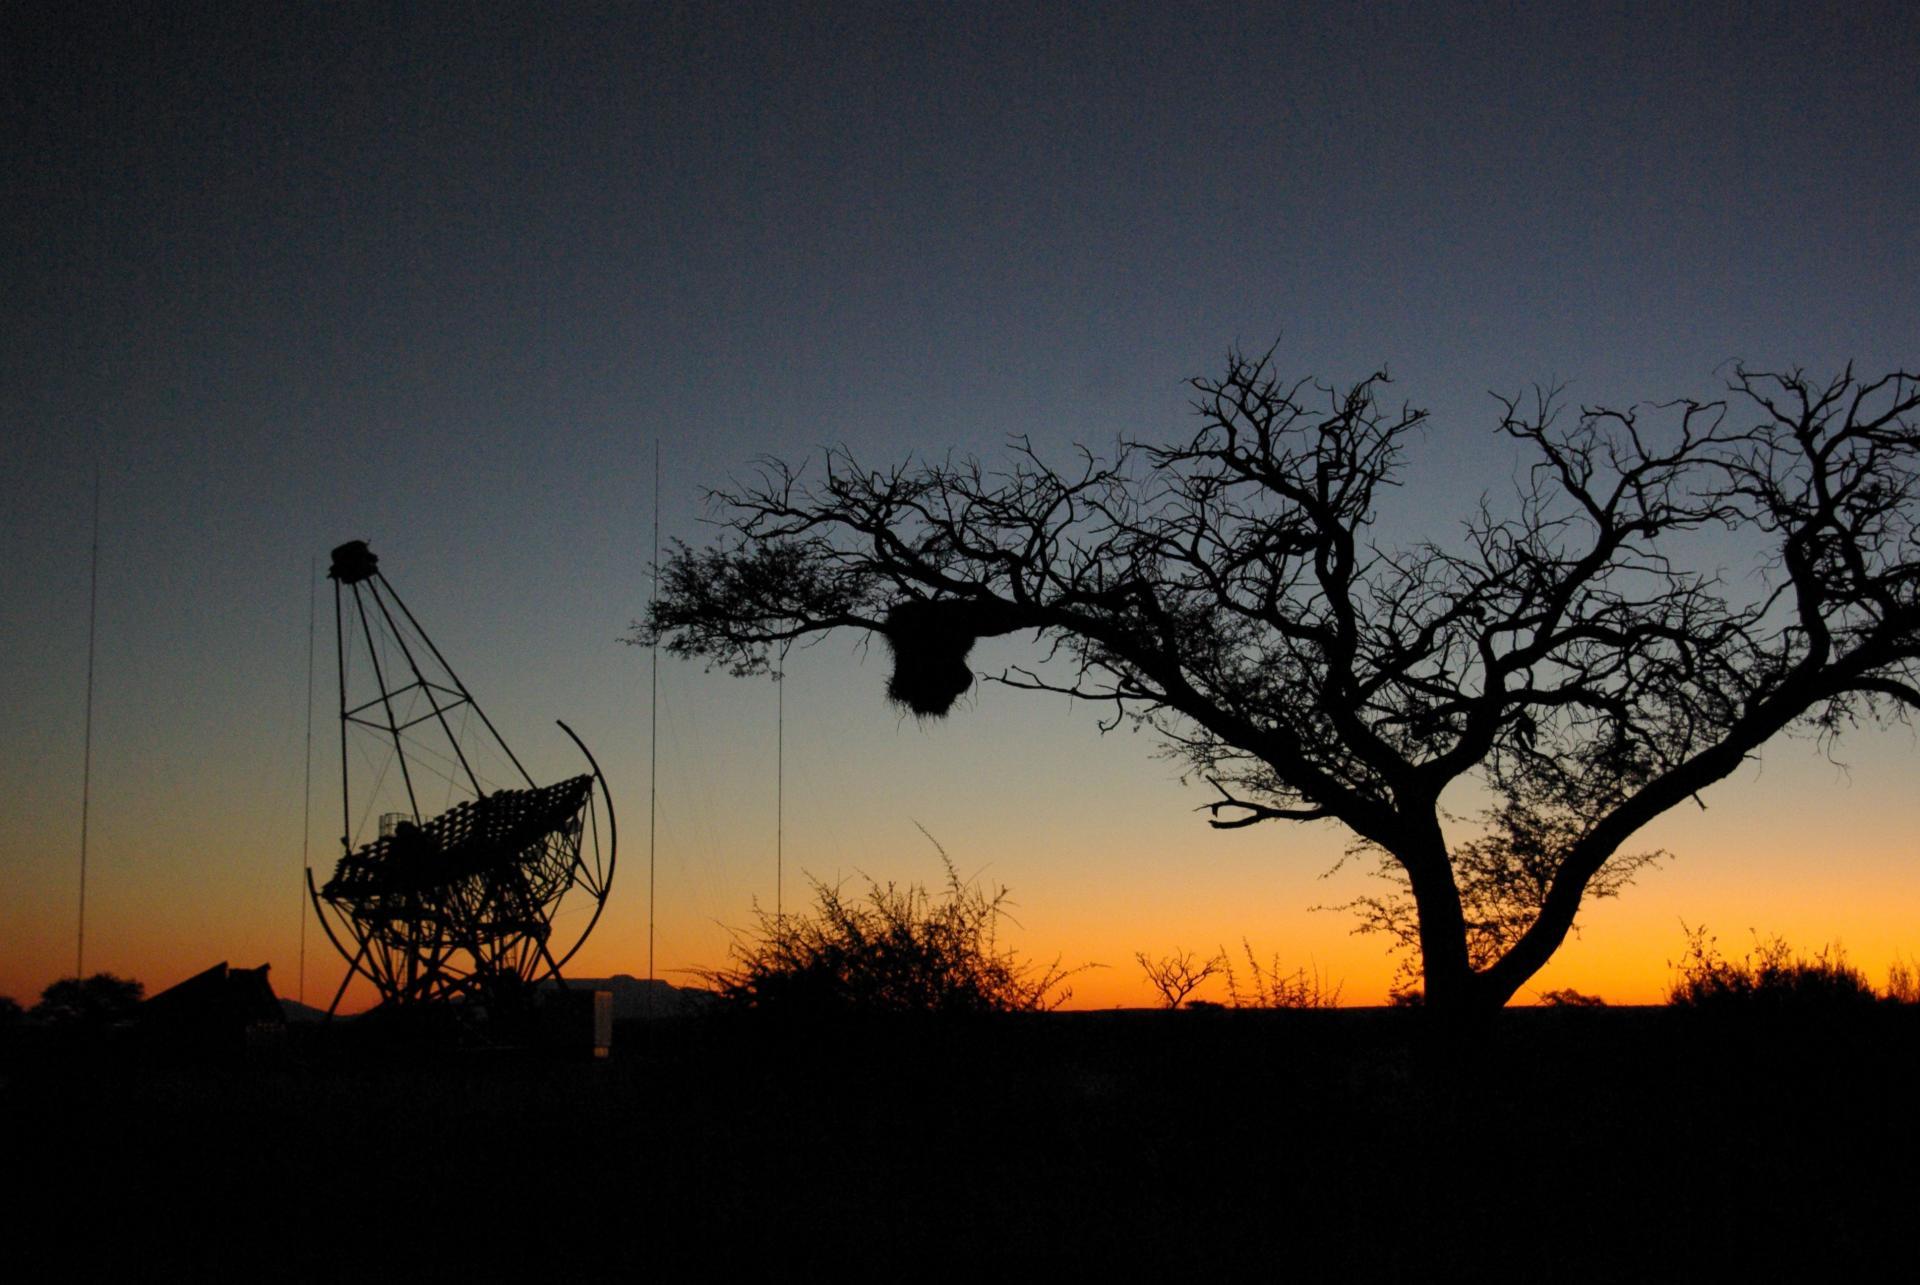 Le téléescope HESS en Namibie